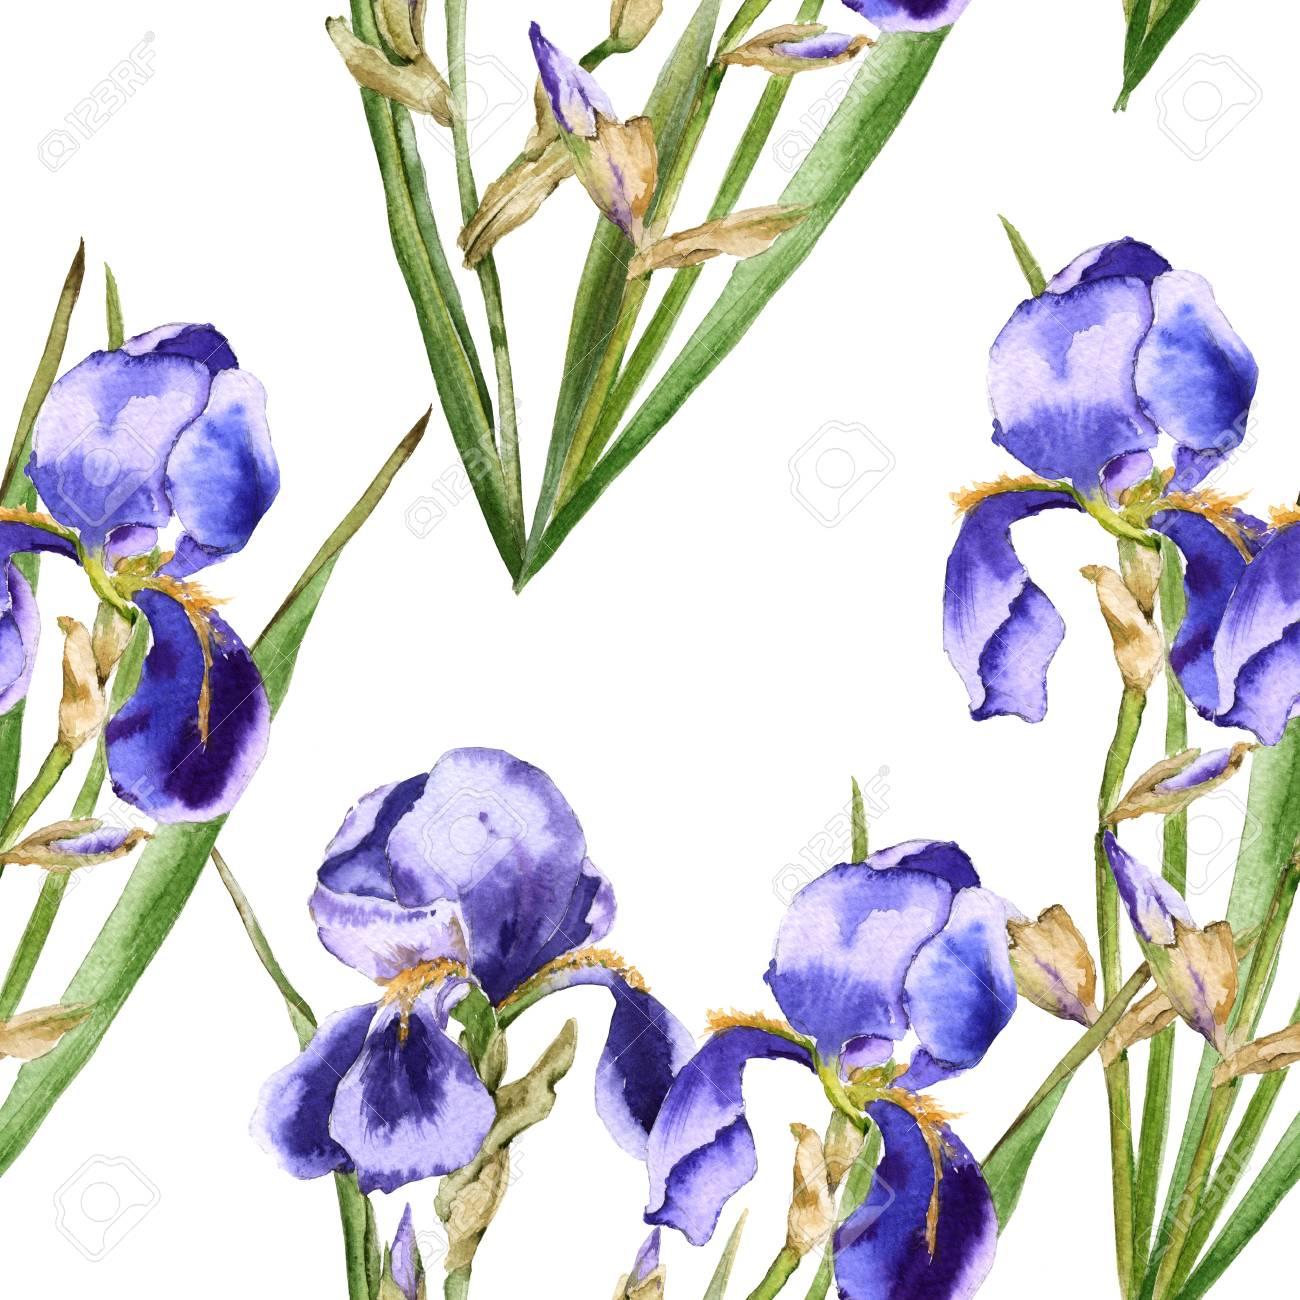 Background of iris flowers seamless pattern for fabric watercolor background of iris flowers seamless pattern for fabric watercolor illustration stock illustration izmirmasajfo